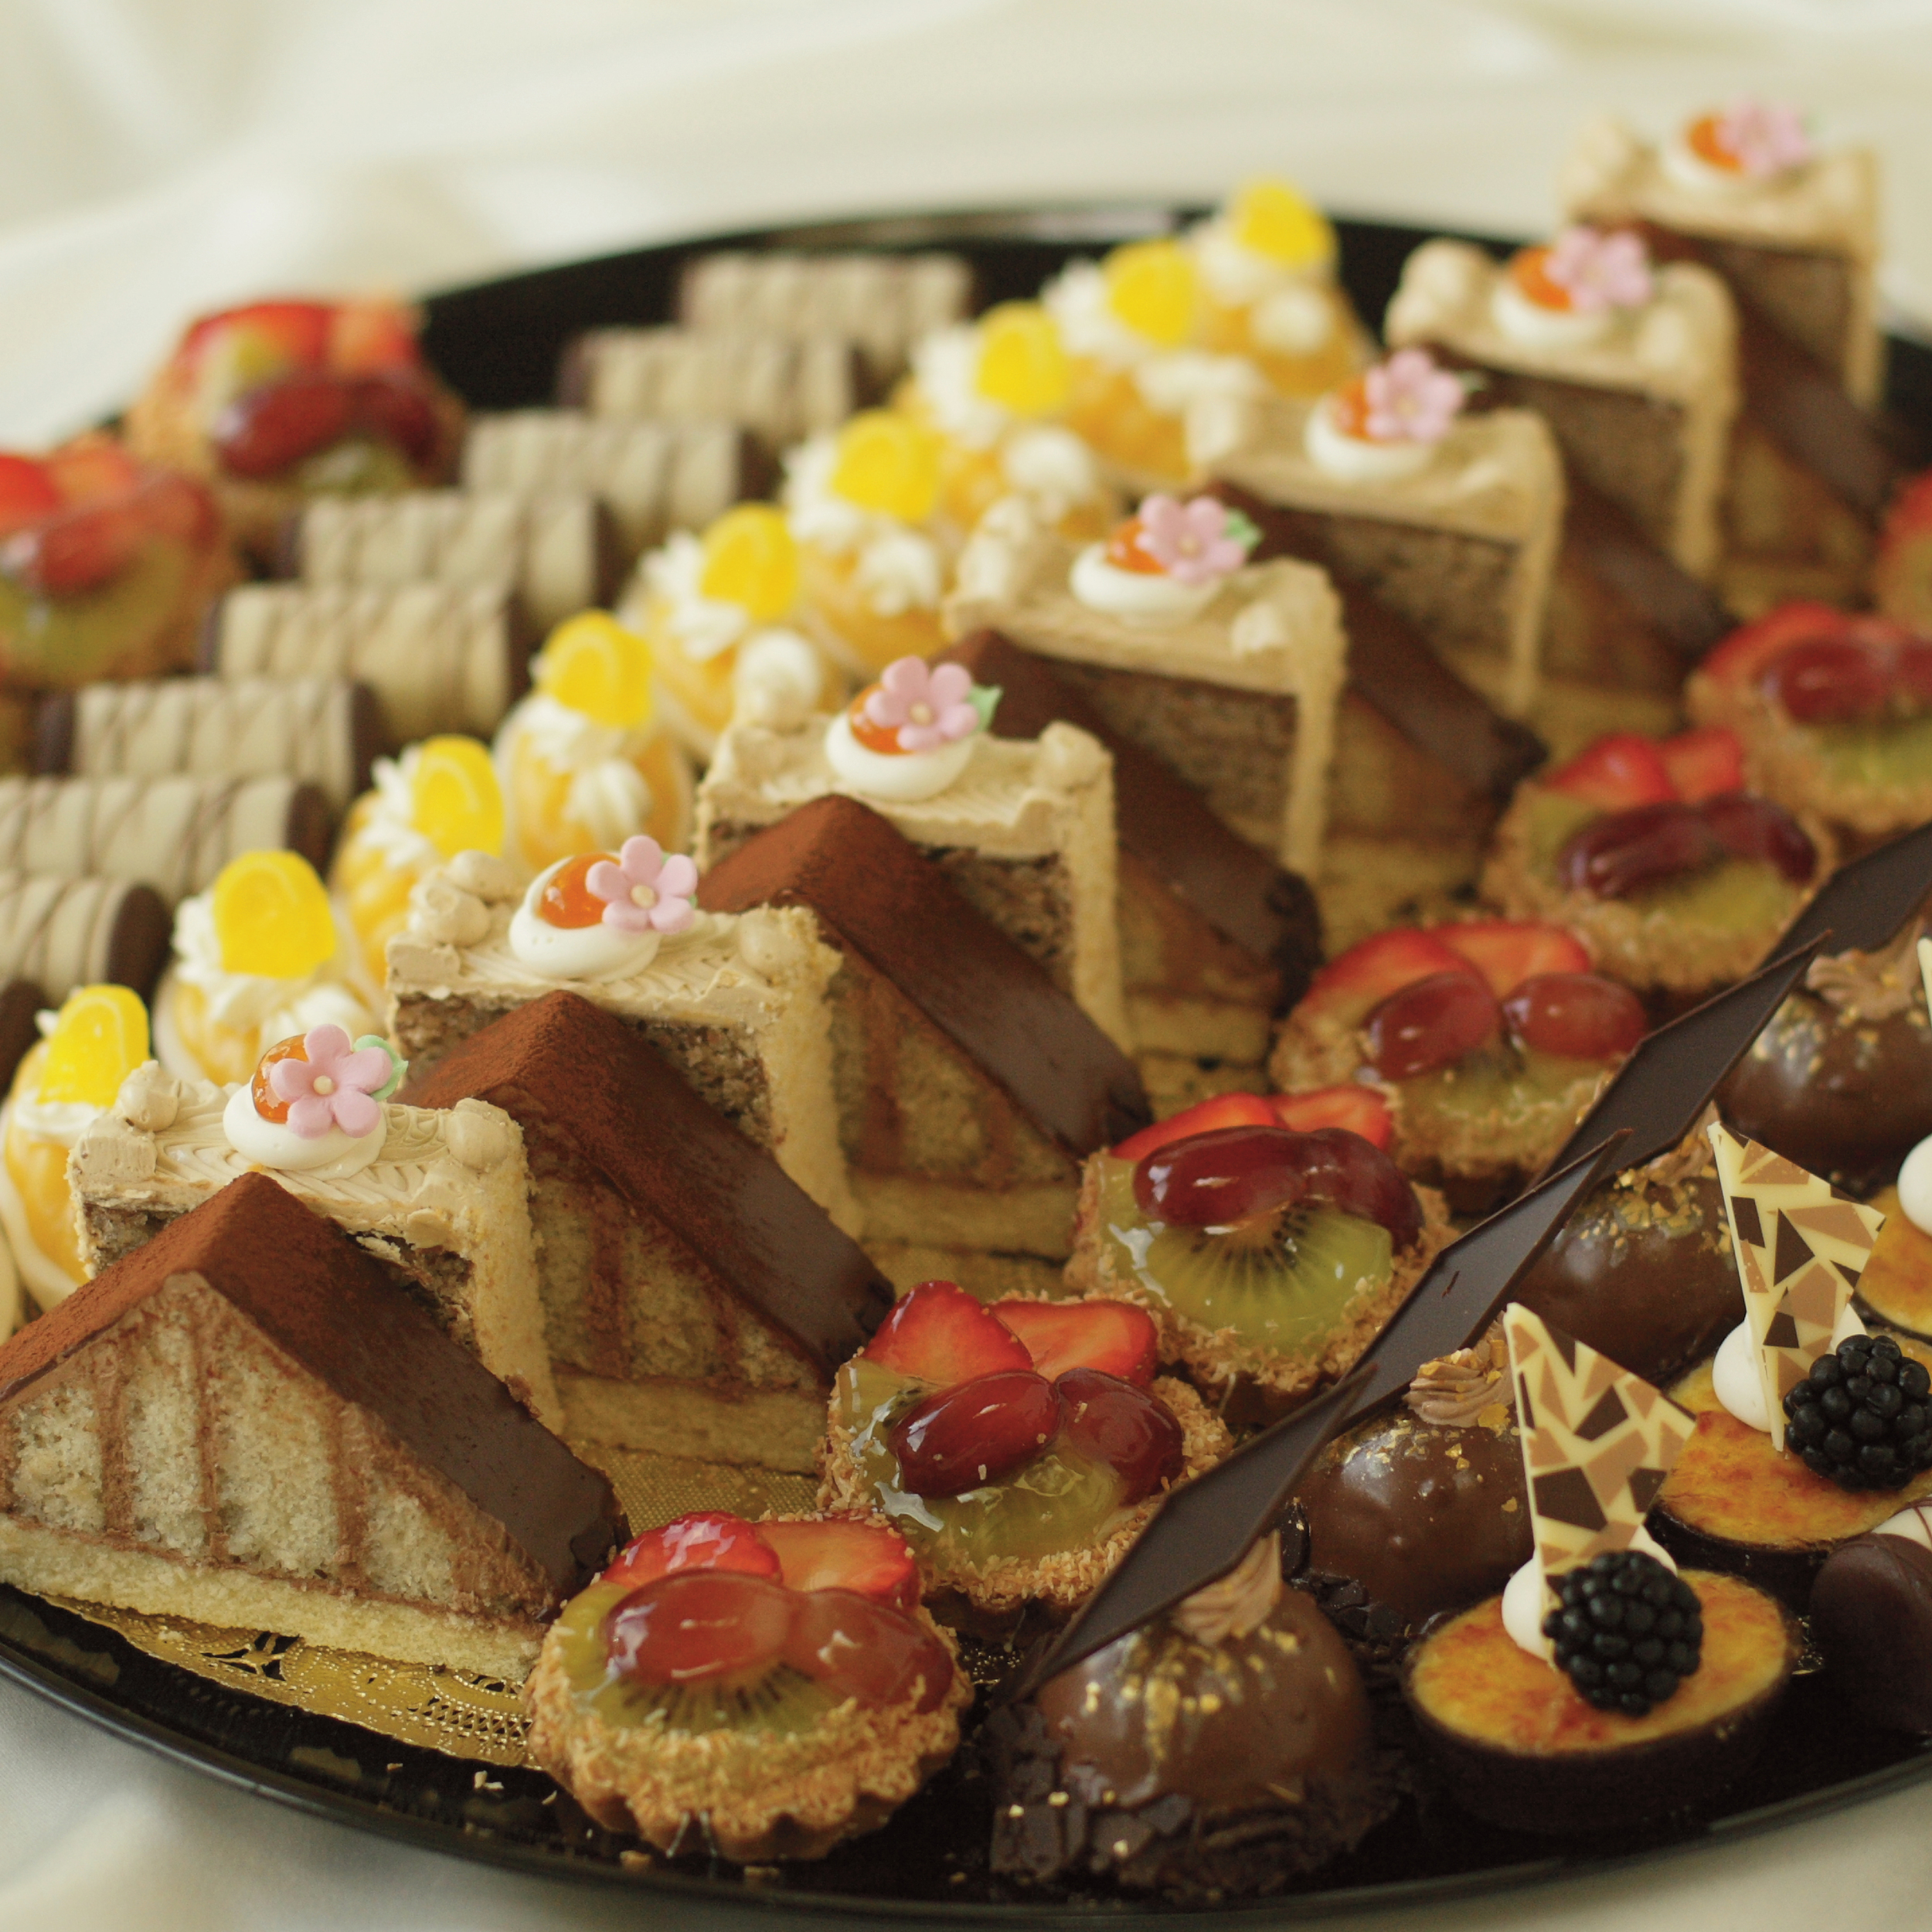 pastry photo 2.jpg